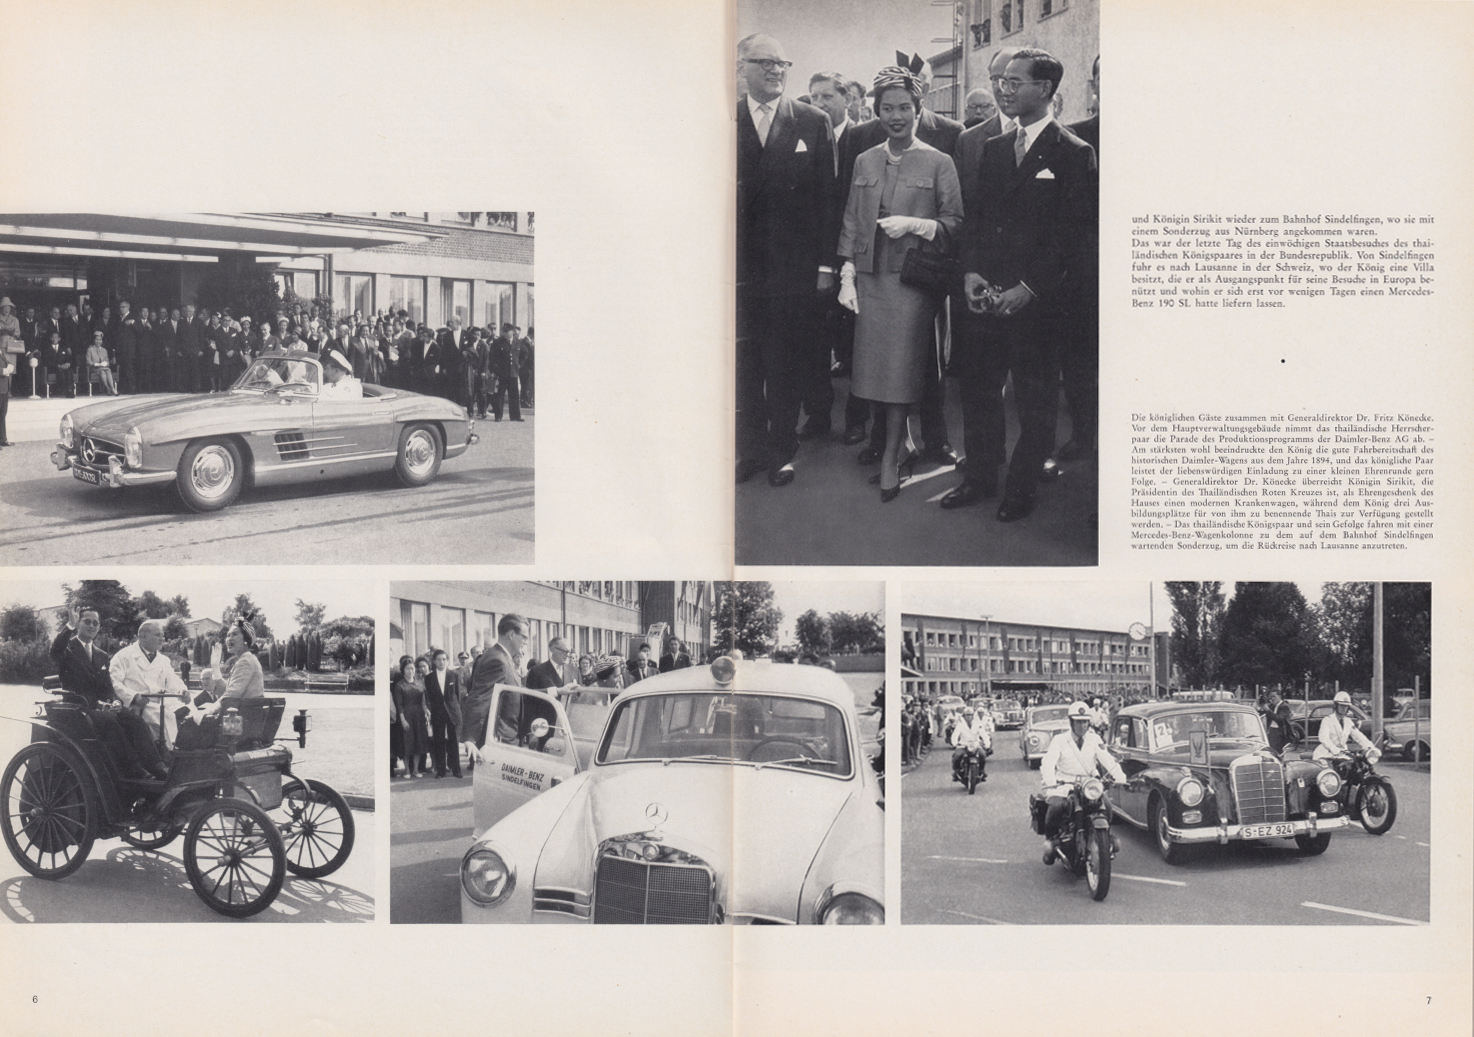 (REVISTA): Periódico In aller welt n.º 44 - Mercedes-Benz no mundo - 1960 - multilingue 004